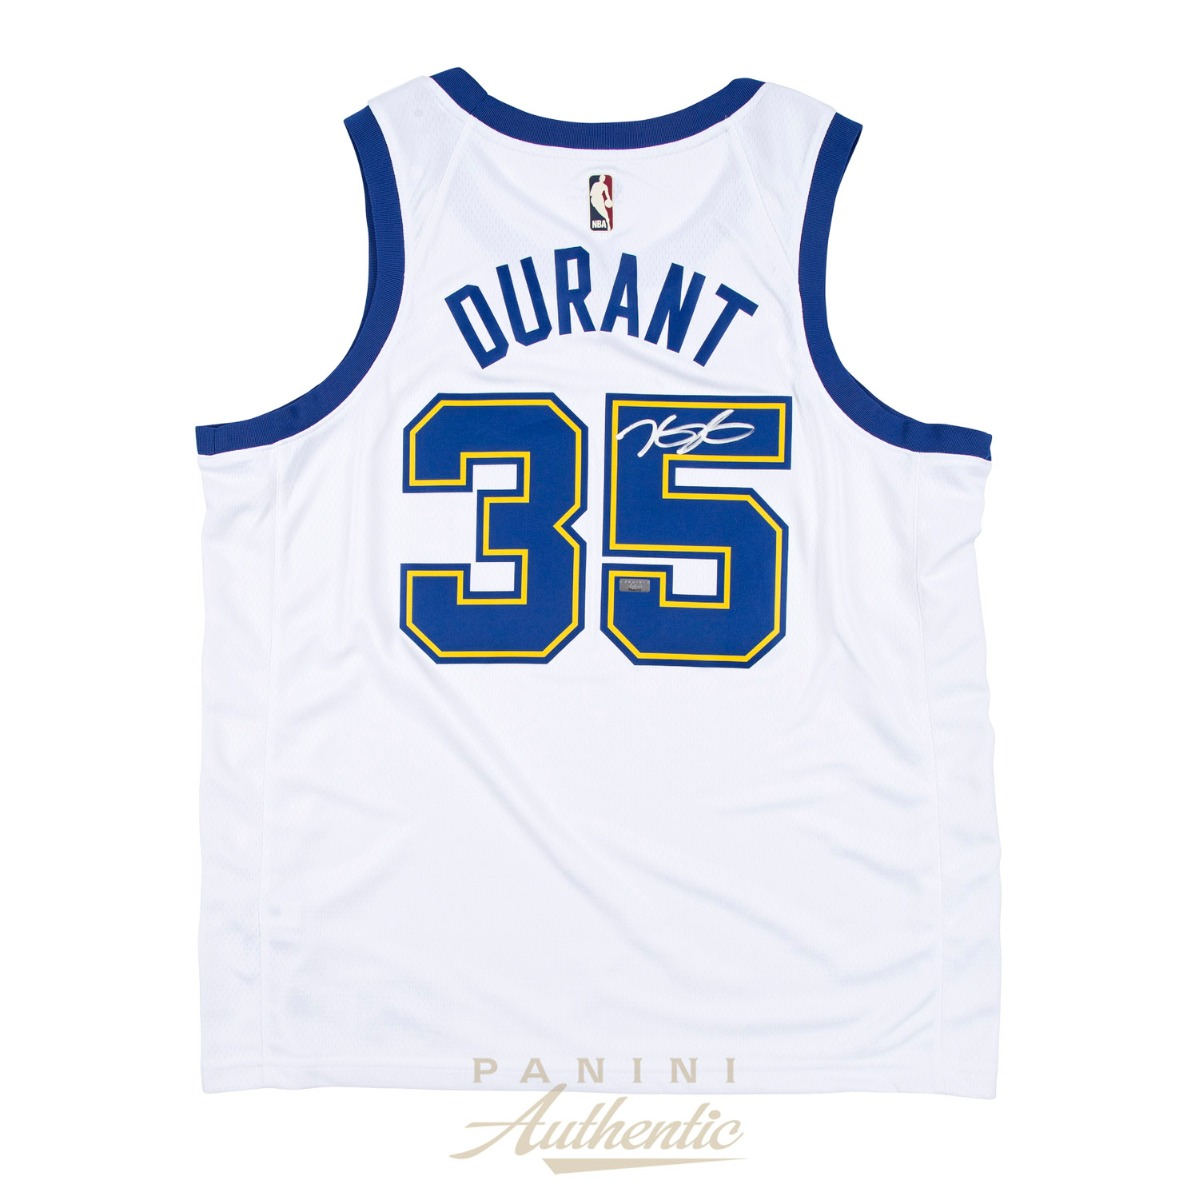 timeless design 97ff4 4a548 Kevin Durant Autographed Nike Golden State Warriors Hardwood ...